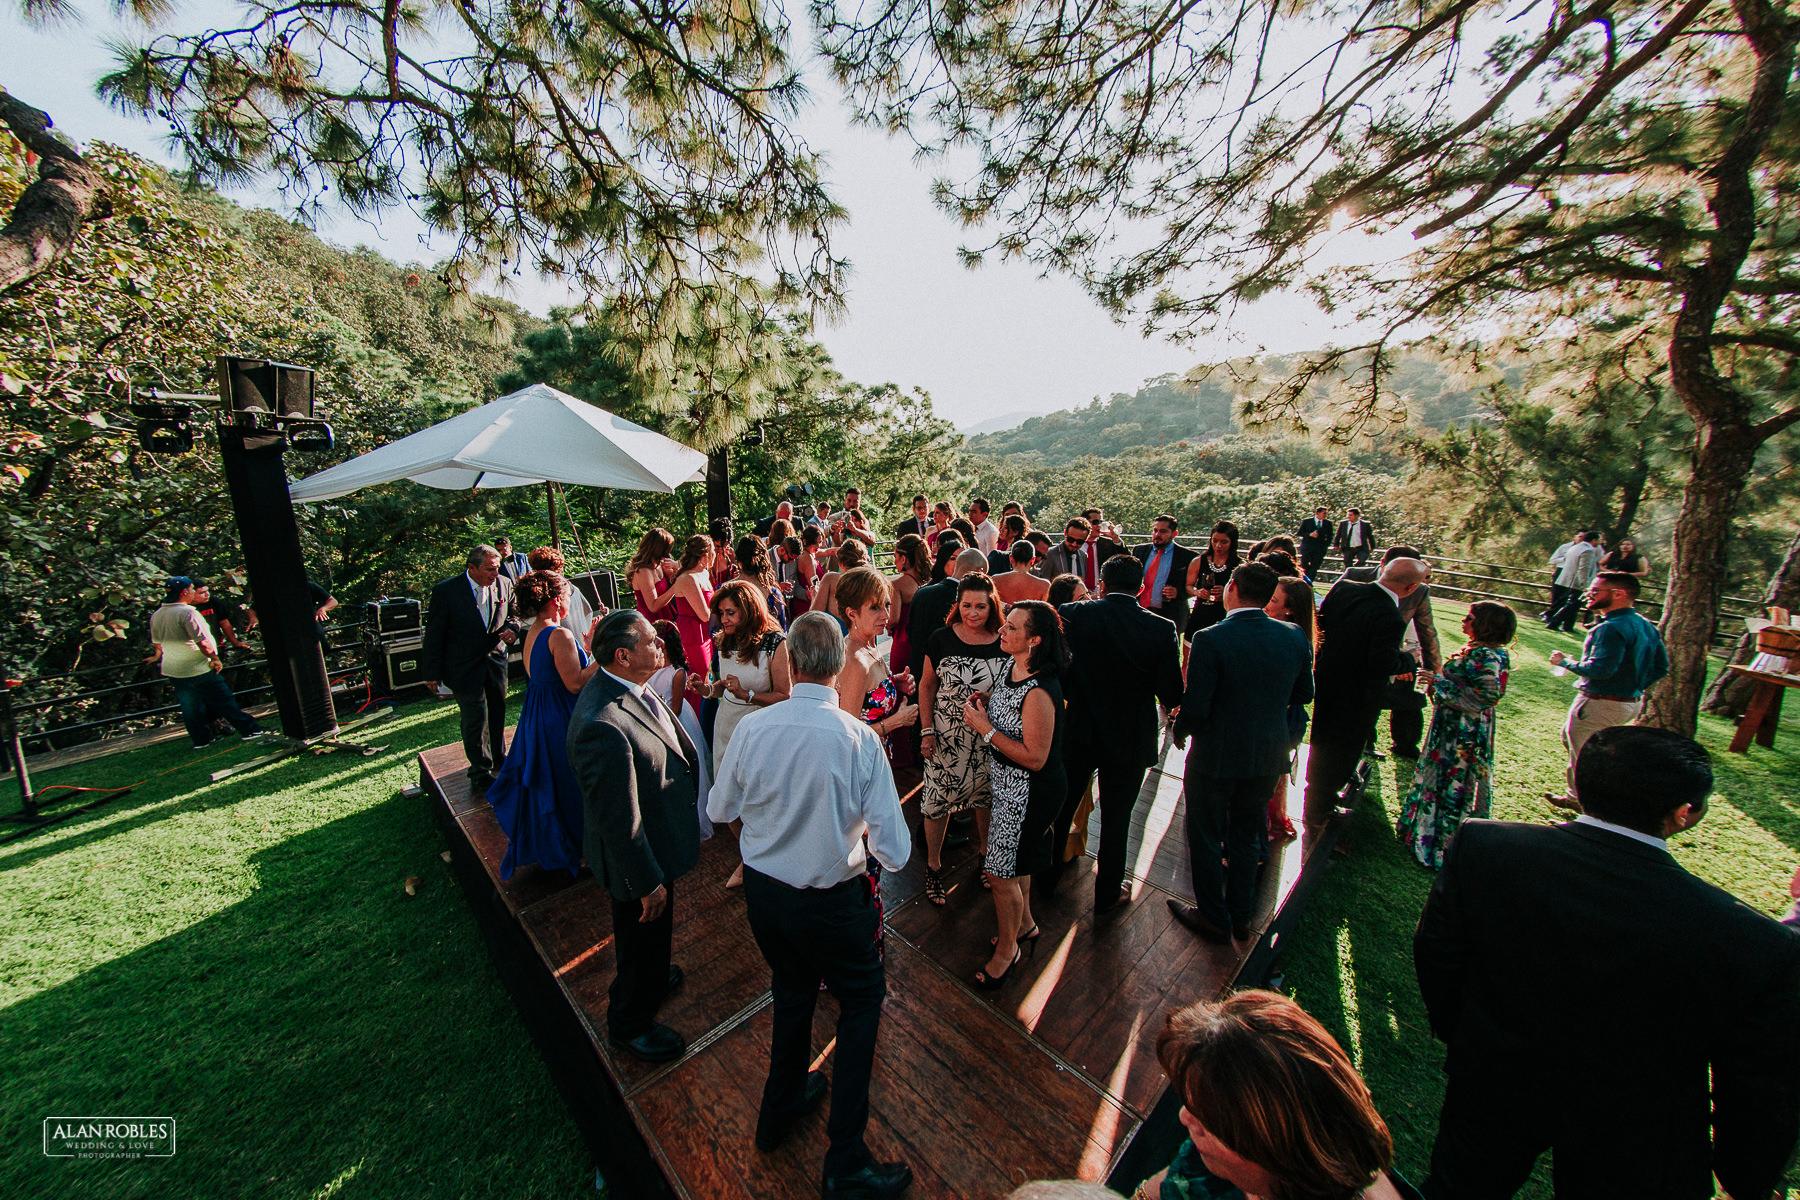 Fotografo de bodas guadalajara Alan Robles - Pinare terraza bistro 50